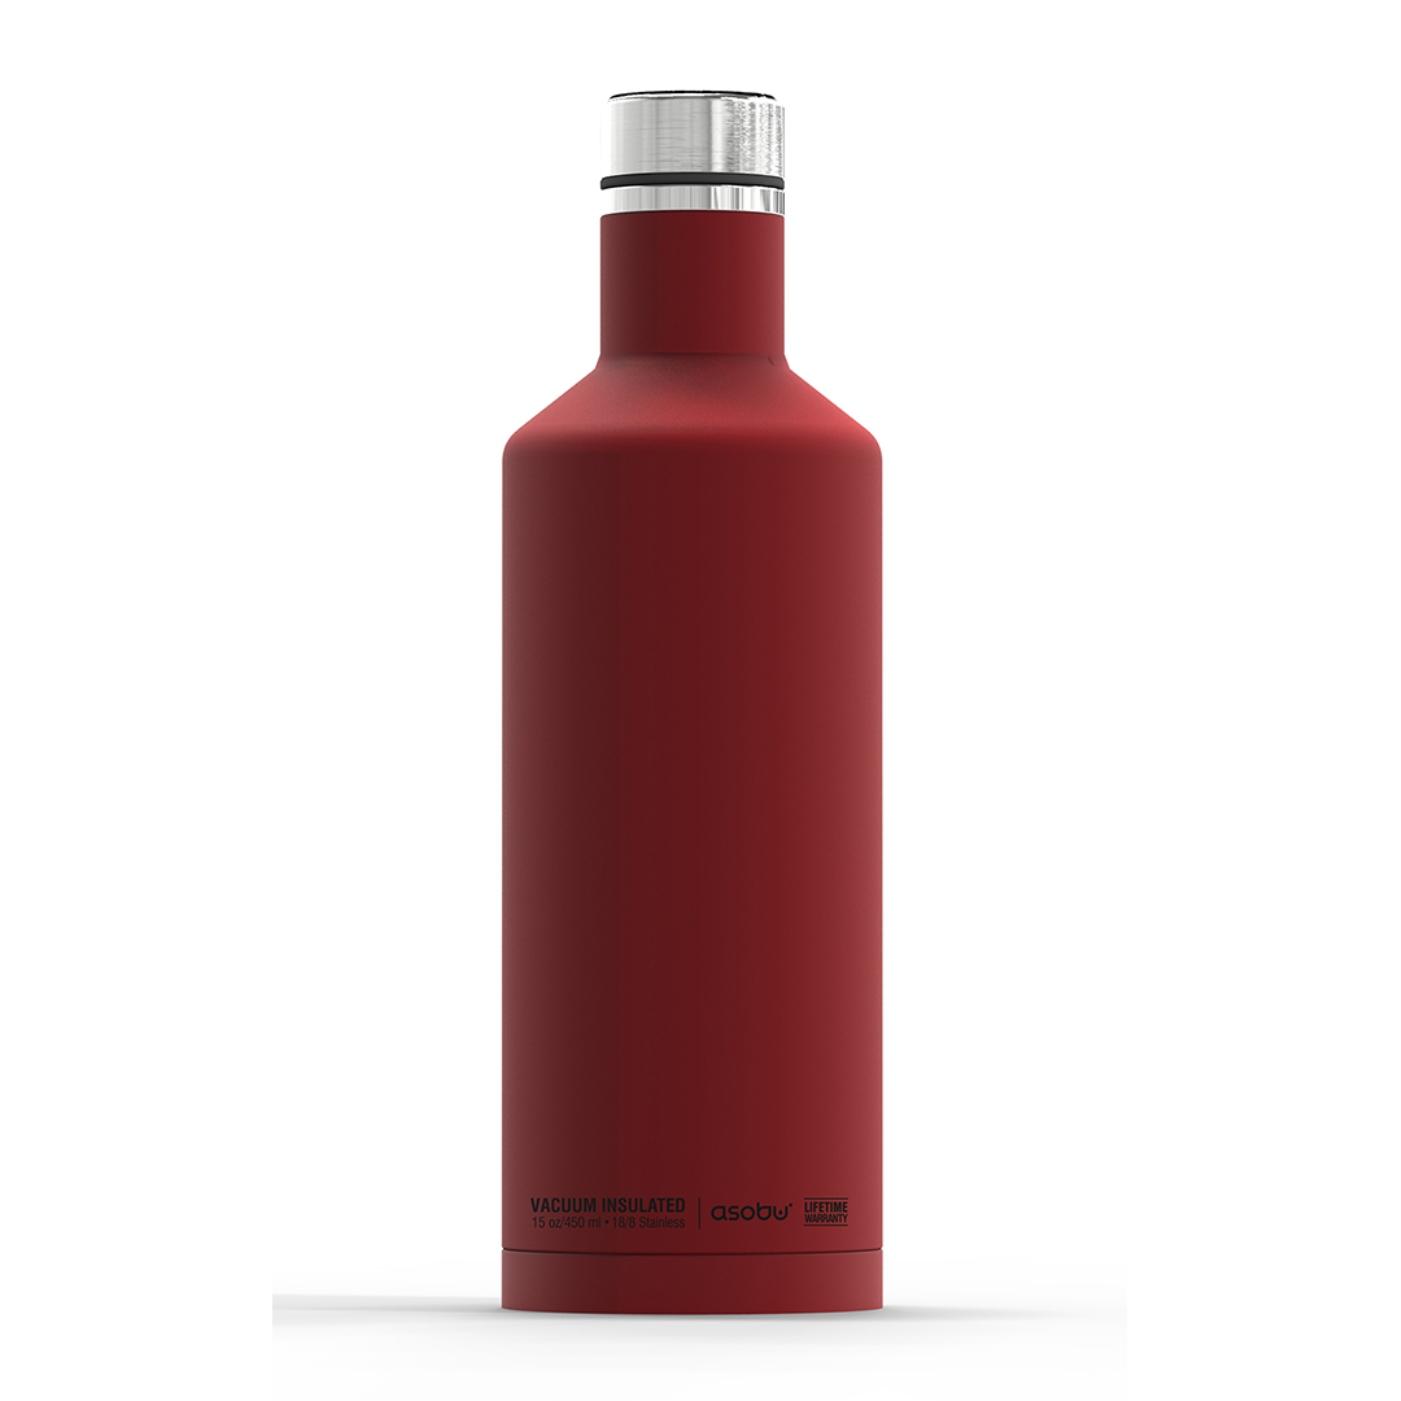 Онлайн каталог PROMENU: Термобутылка Asobu TIMES SQUARE, 0,45 л, красный                                   SBV15 RED